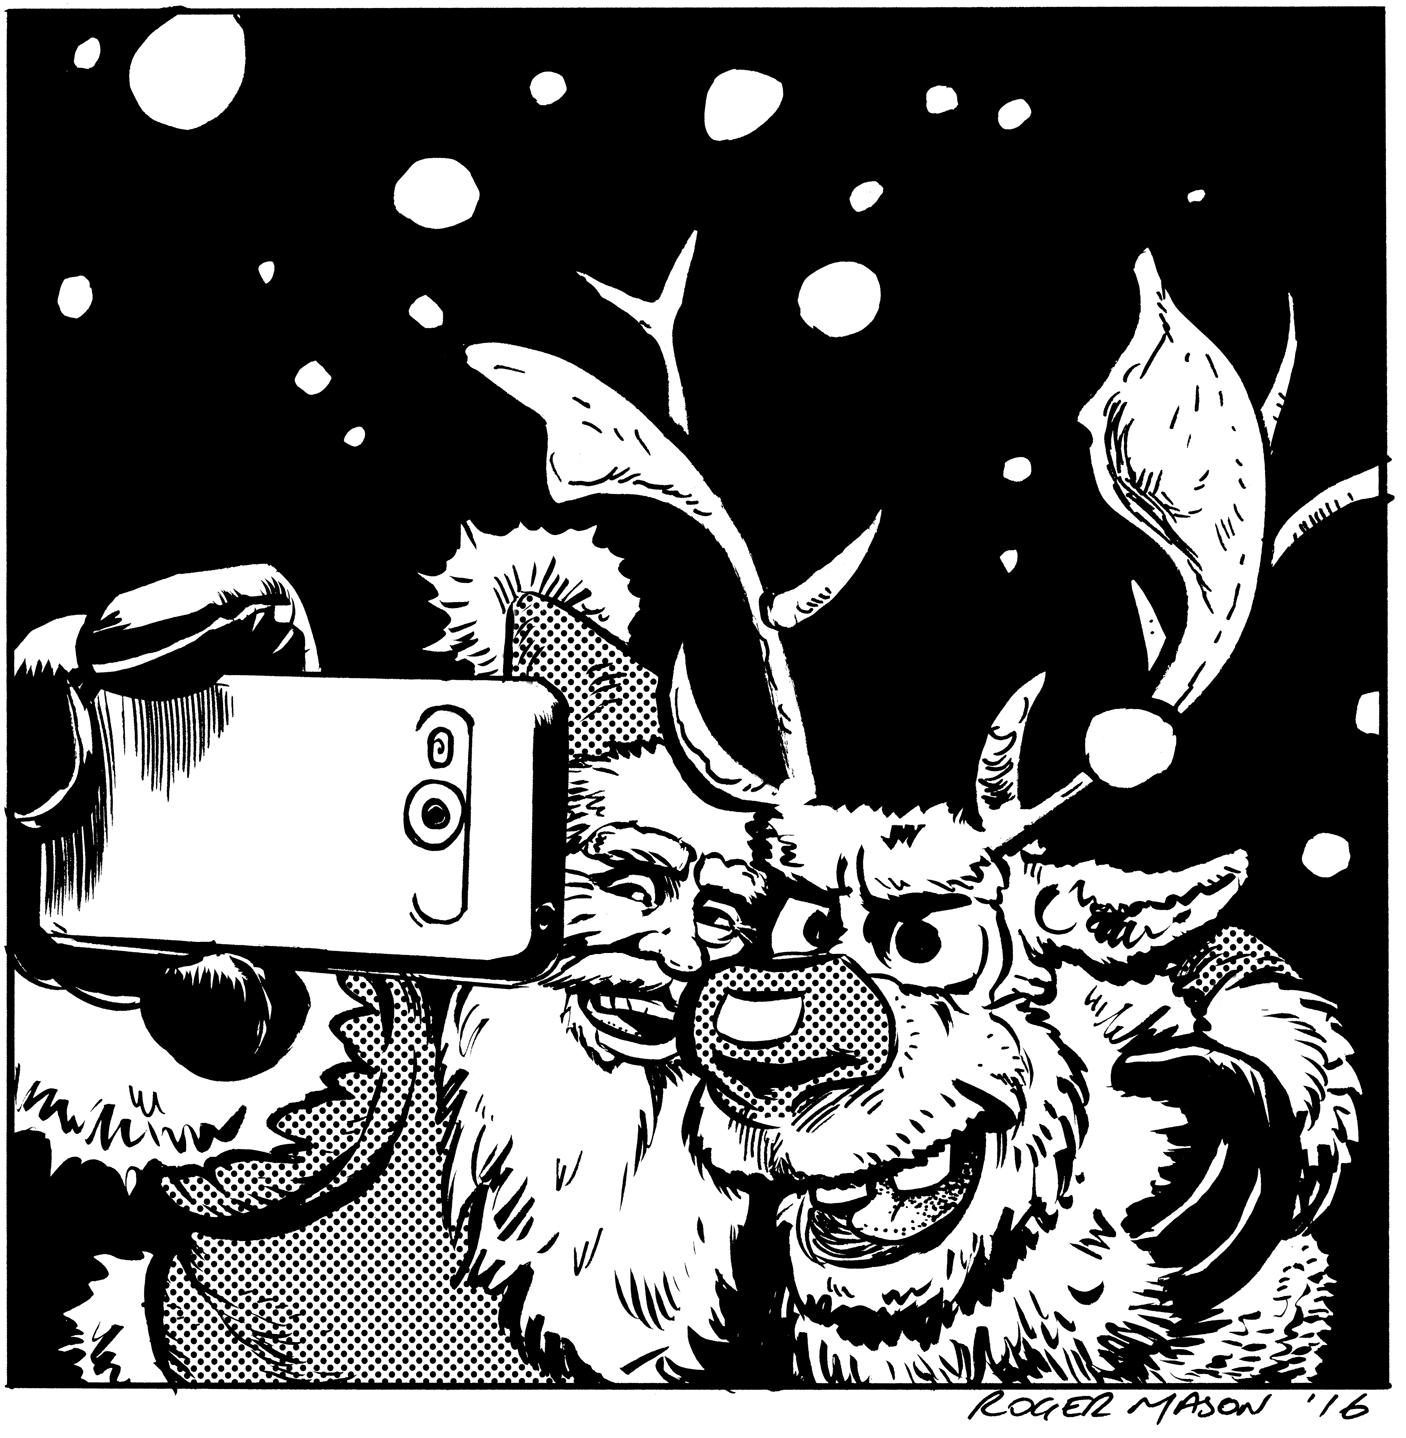 Santa and Rudolf selfie. Christmas card by Roger Mason